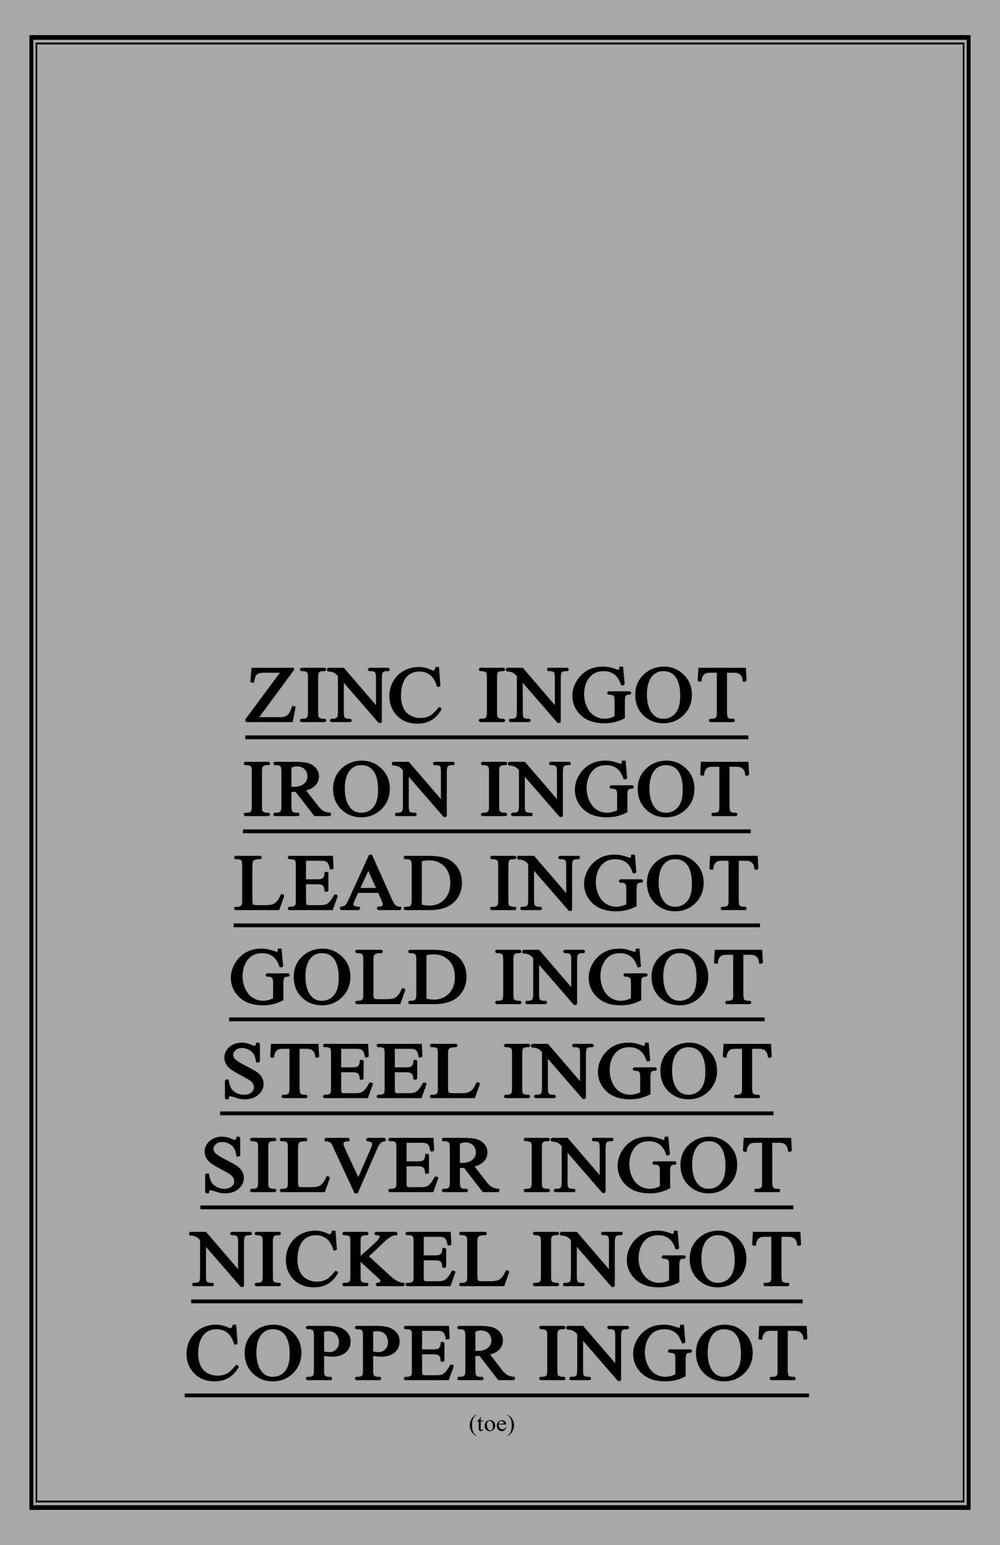 ZINC INGOT big 2.jpg